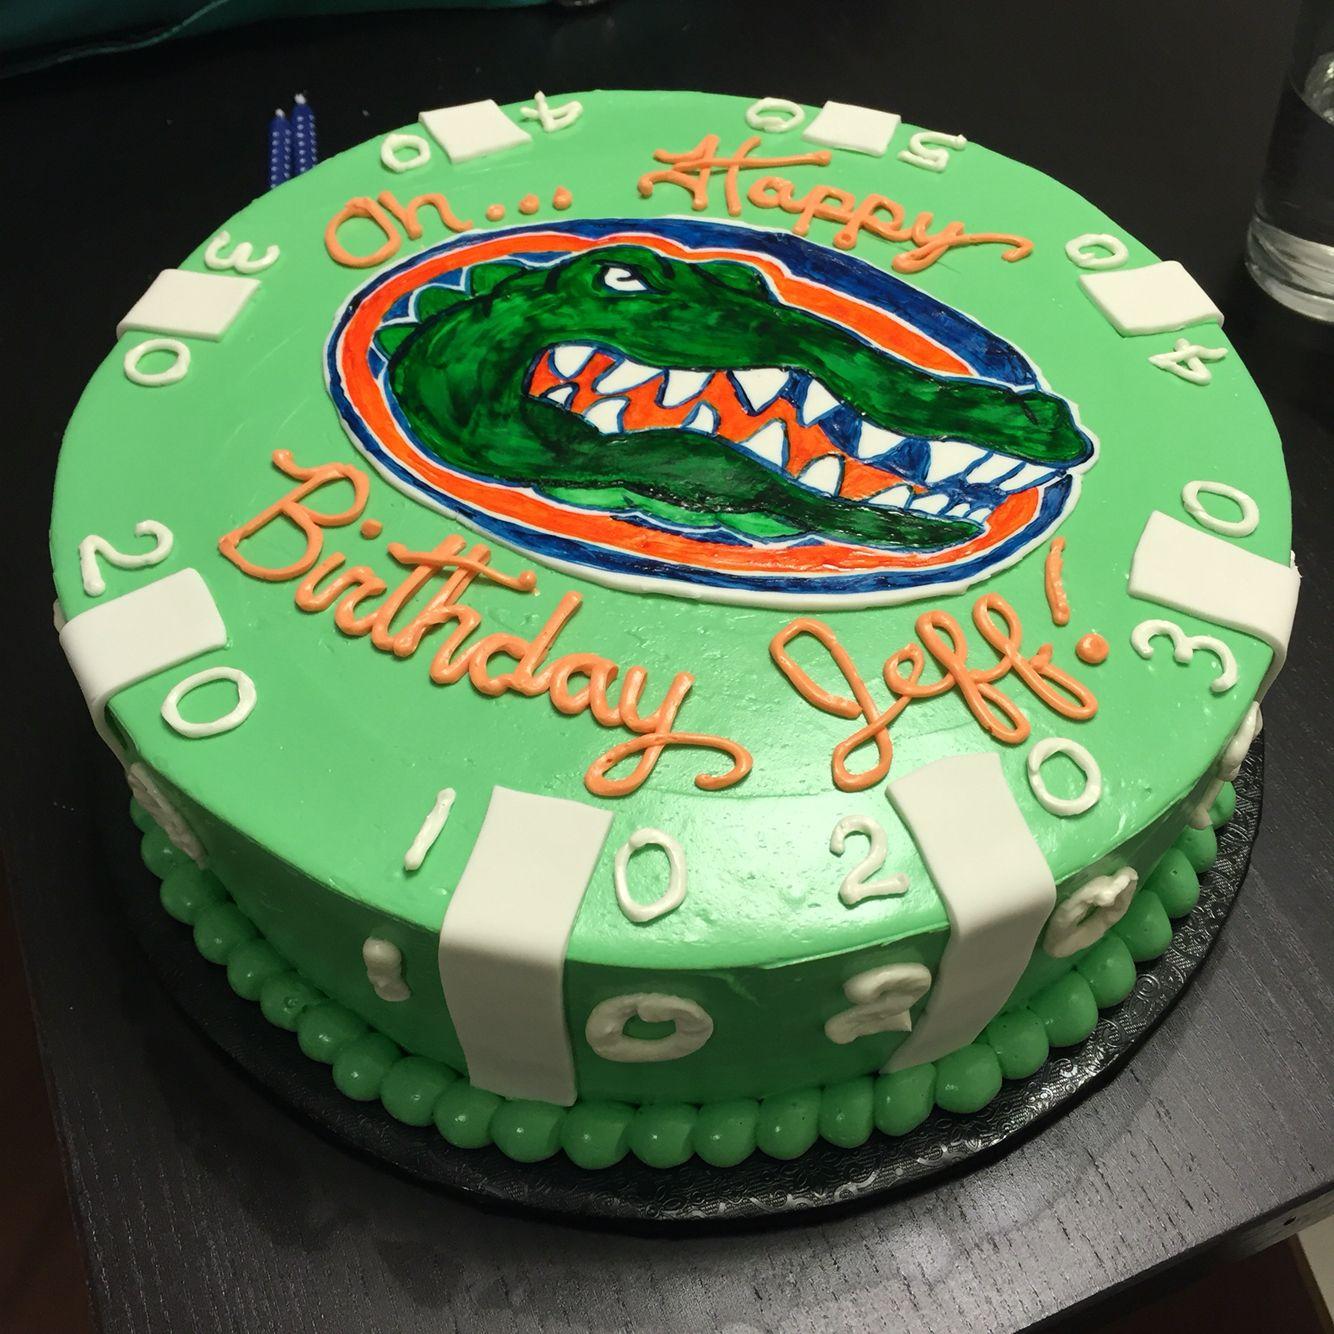 Florida Gators Football Birthday Cake Cakes Ive Made Pinterest